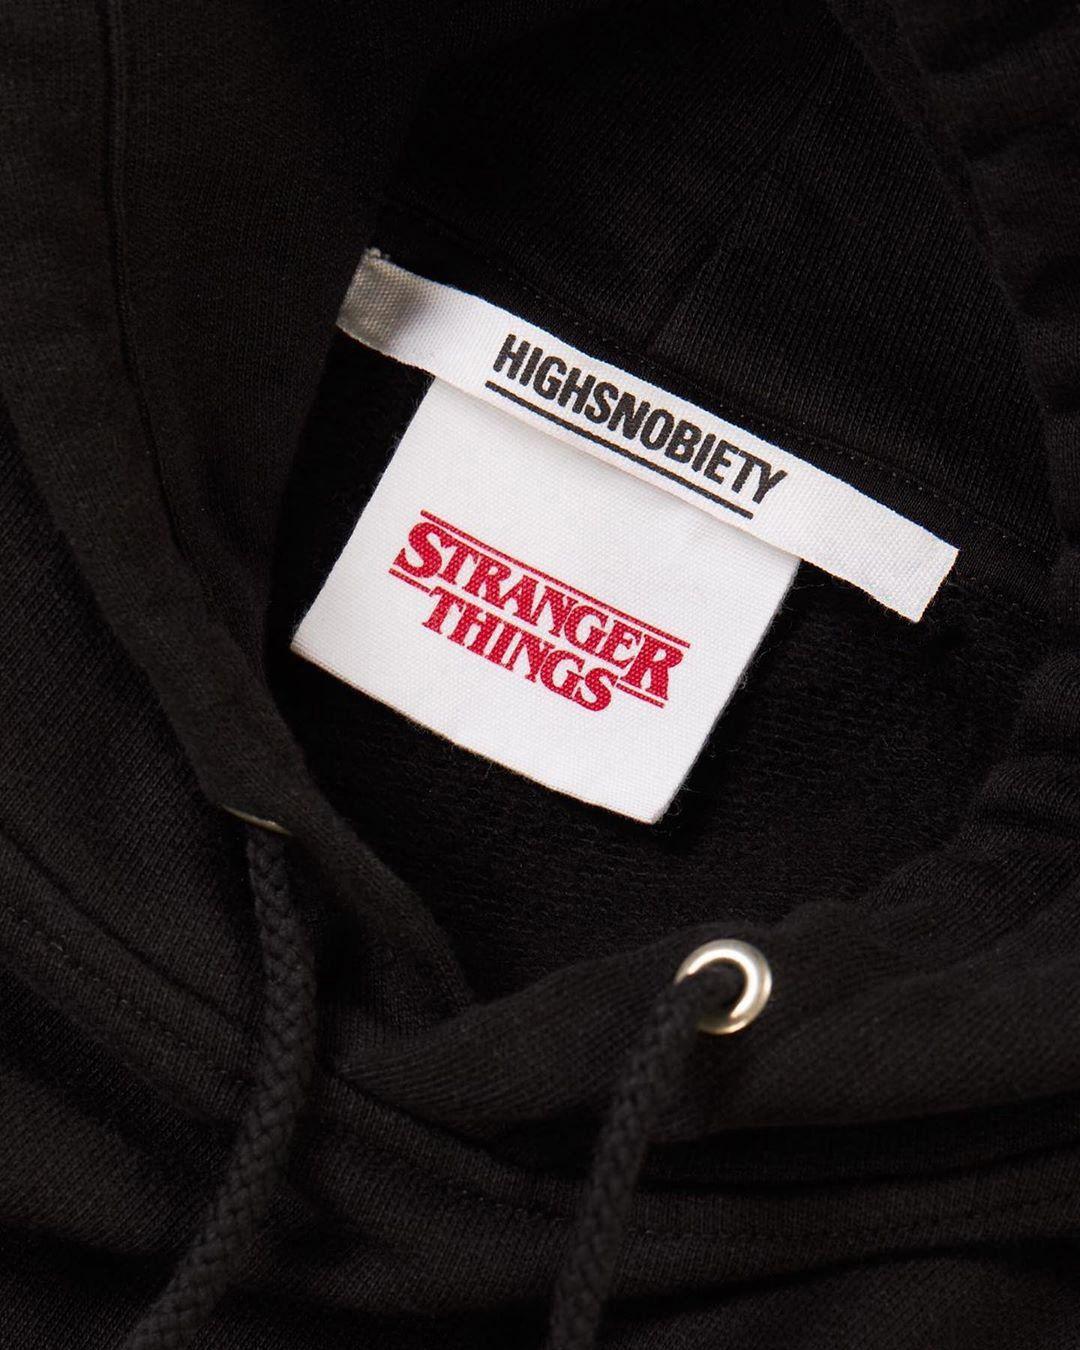 Stranger Things 3 x Highsnobiety Ahoy Hoodie - Black - Image 4